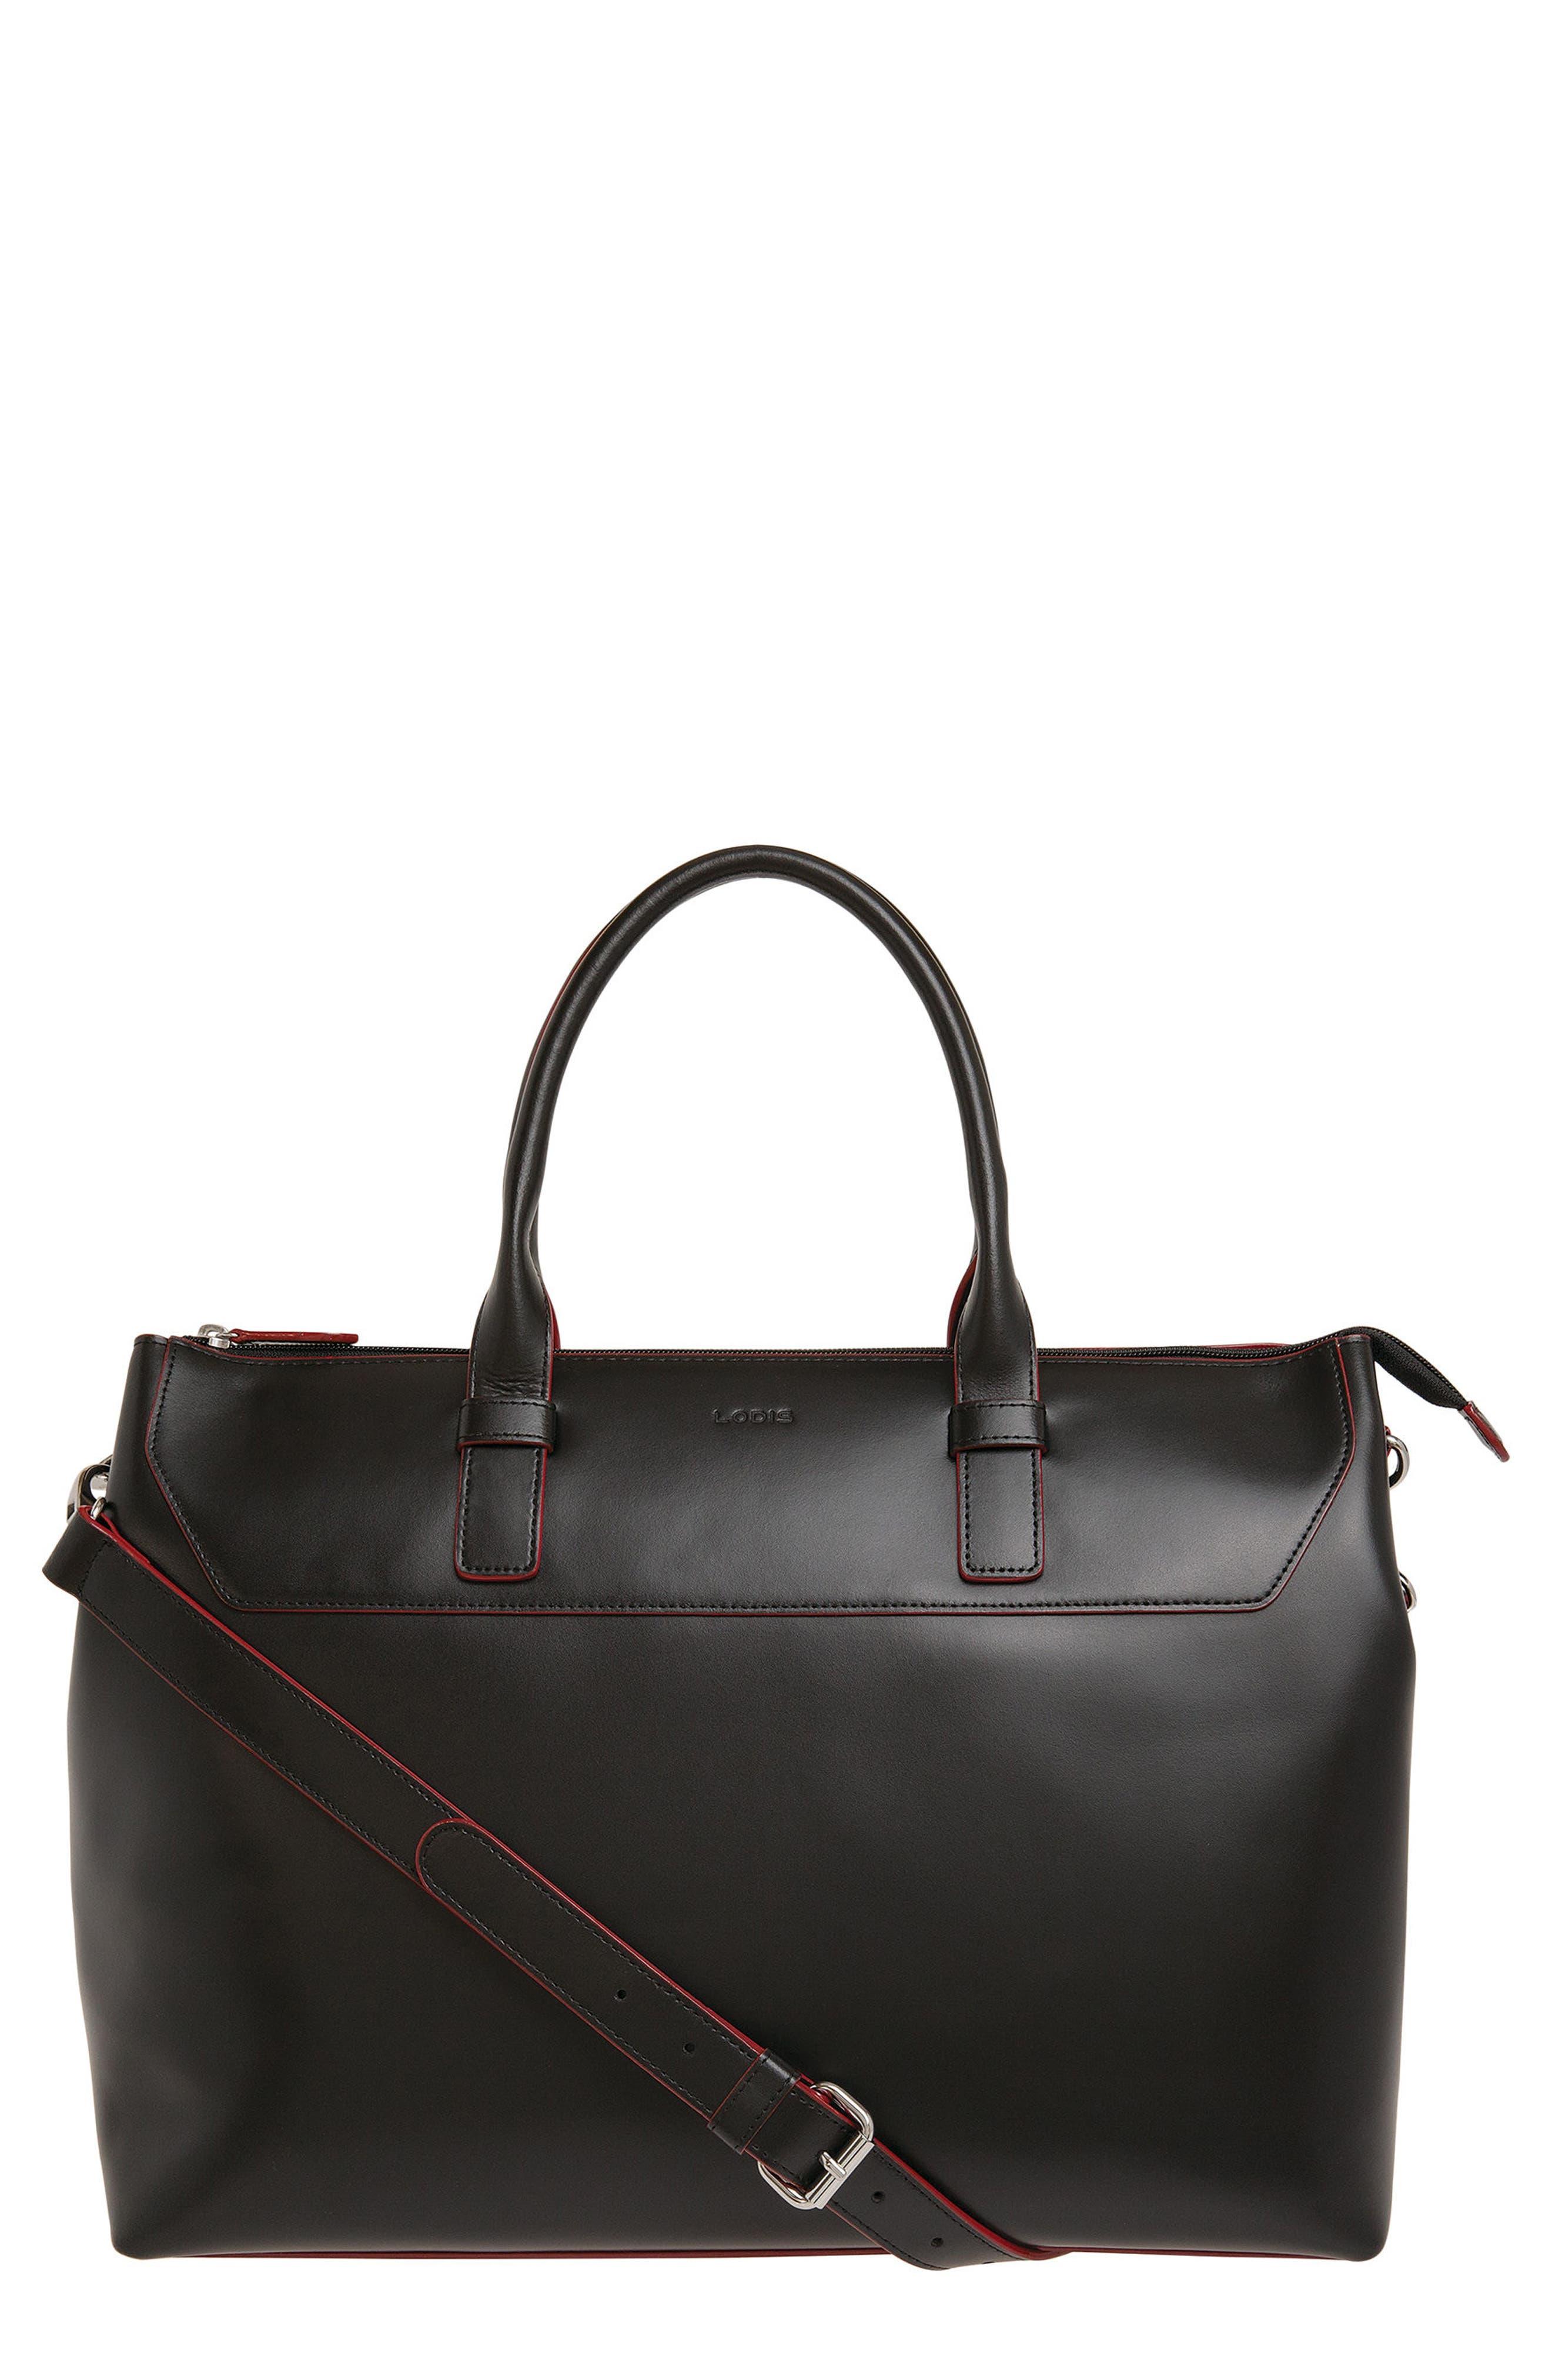 Main Image - Lodis Audrey Wilhelmina Leather Work Satchel